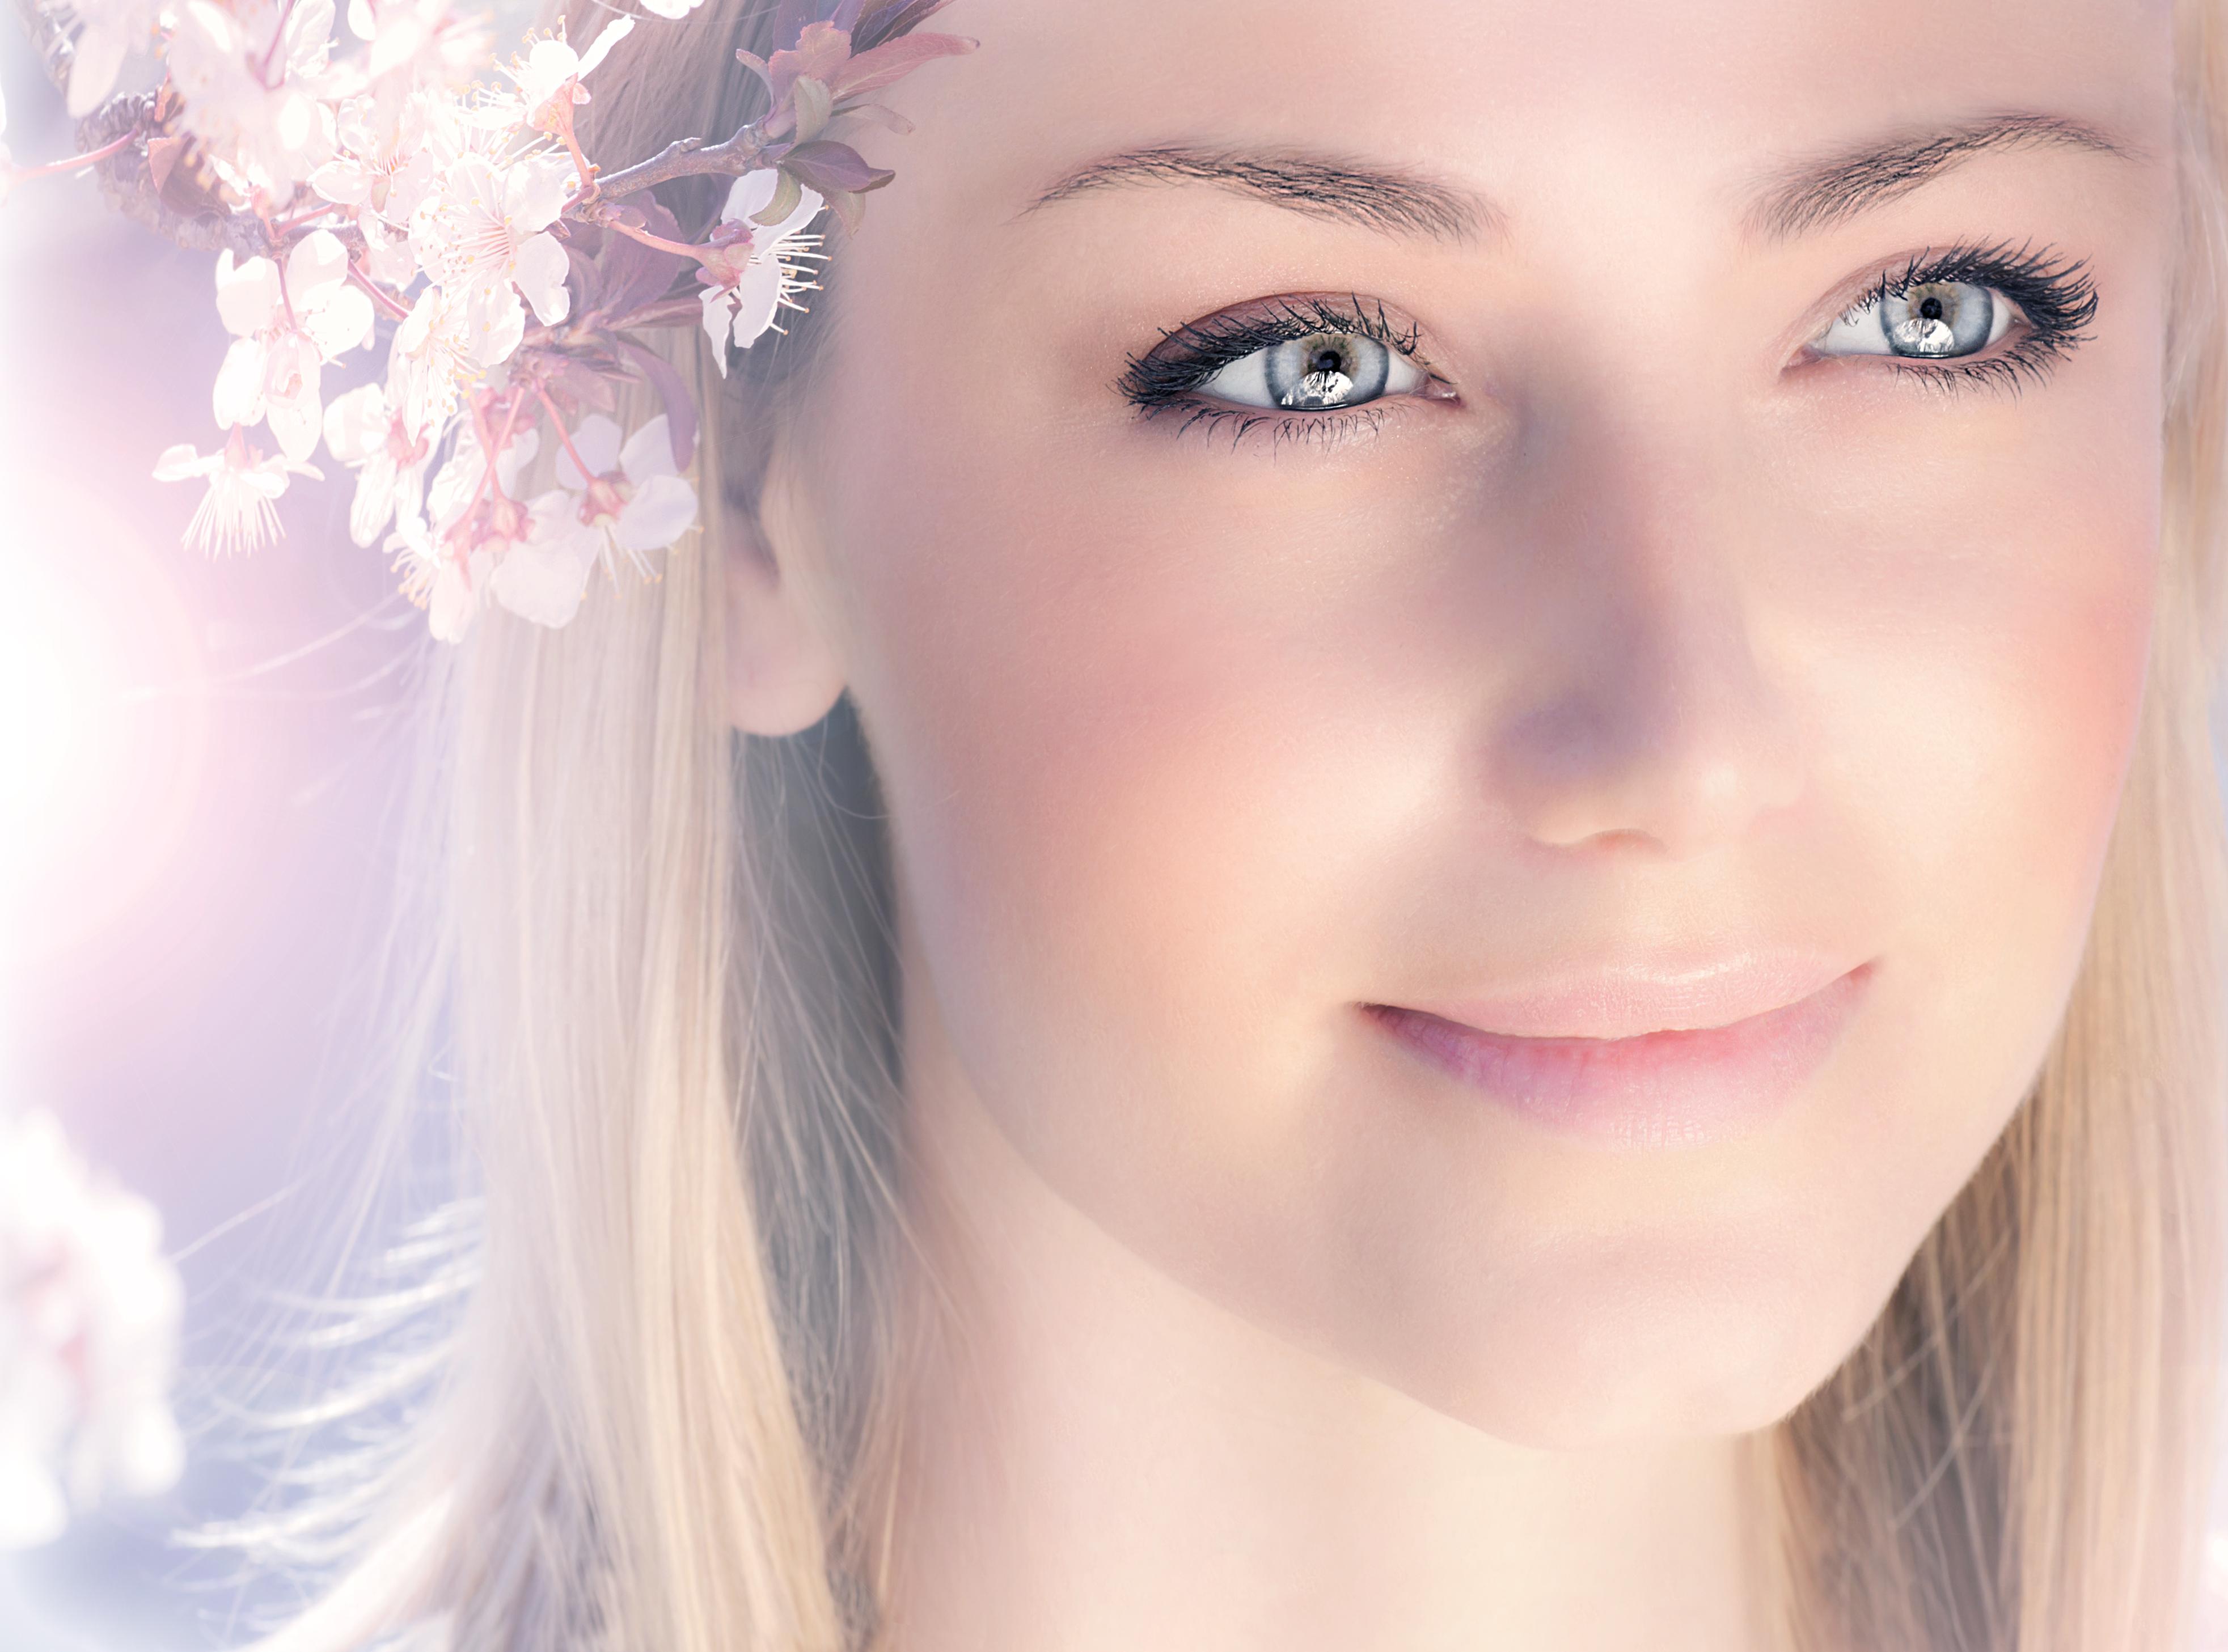 schoonheidssalon Tiel Beauty Licious